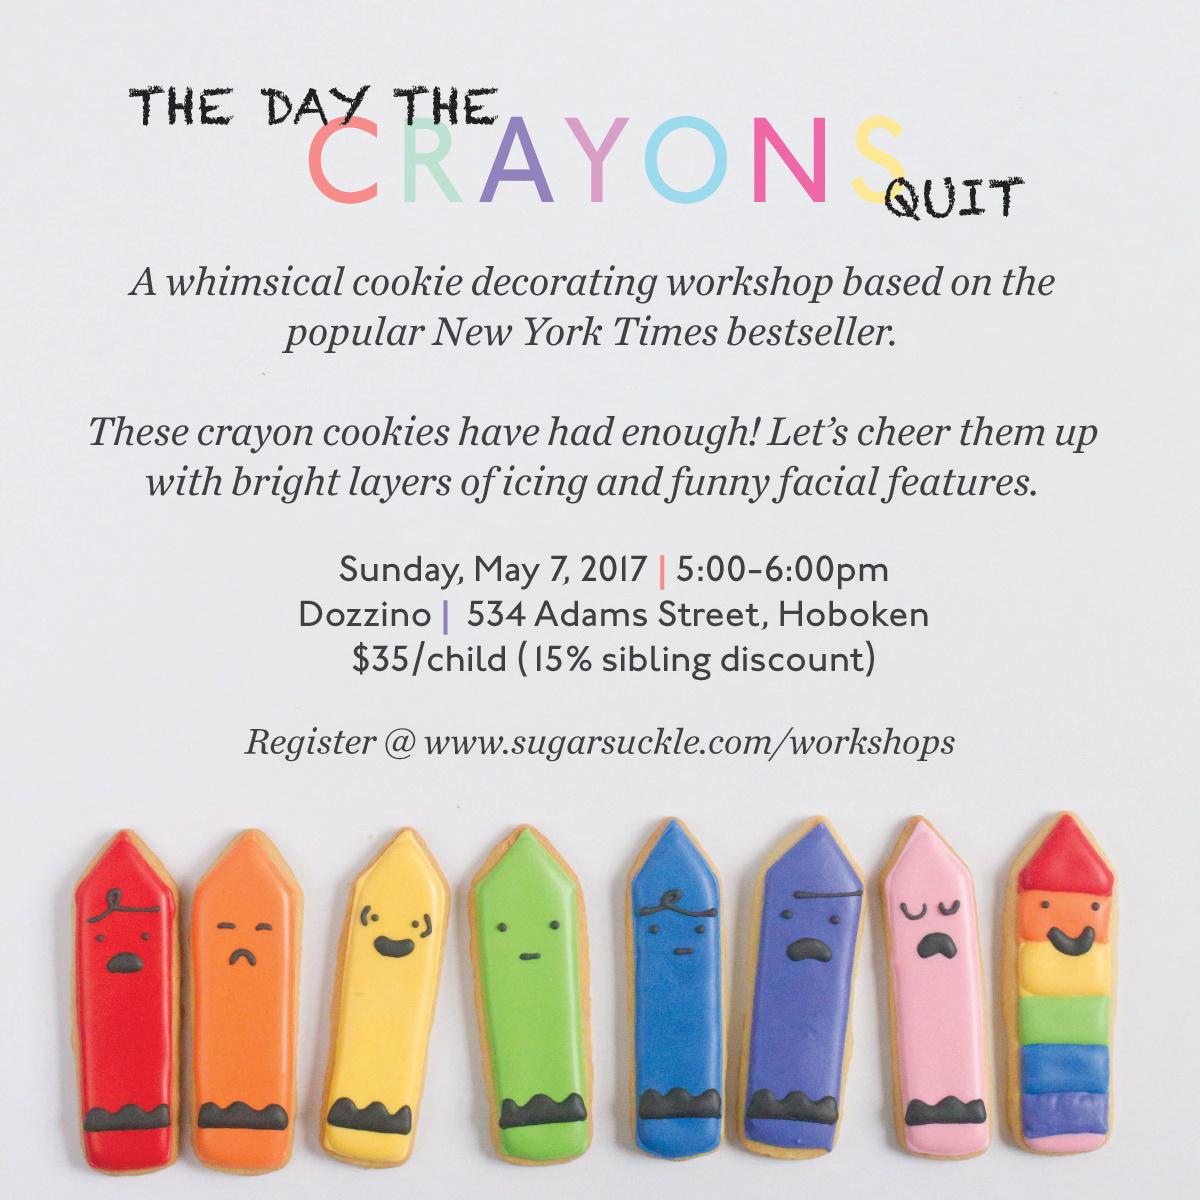 Crayons-01-01